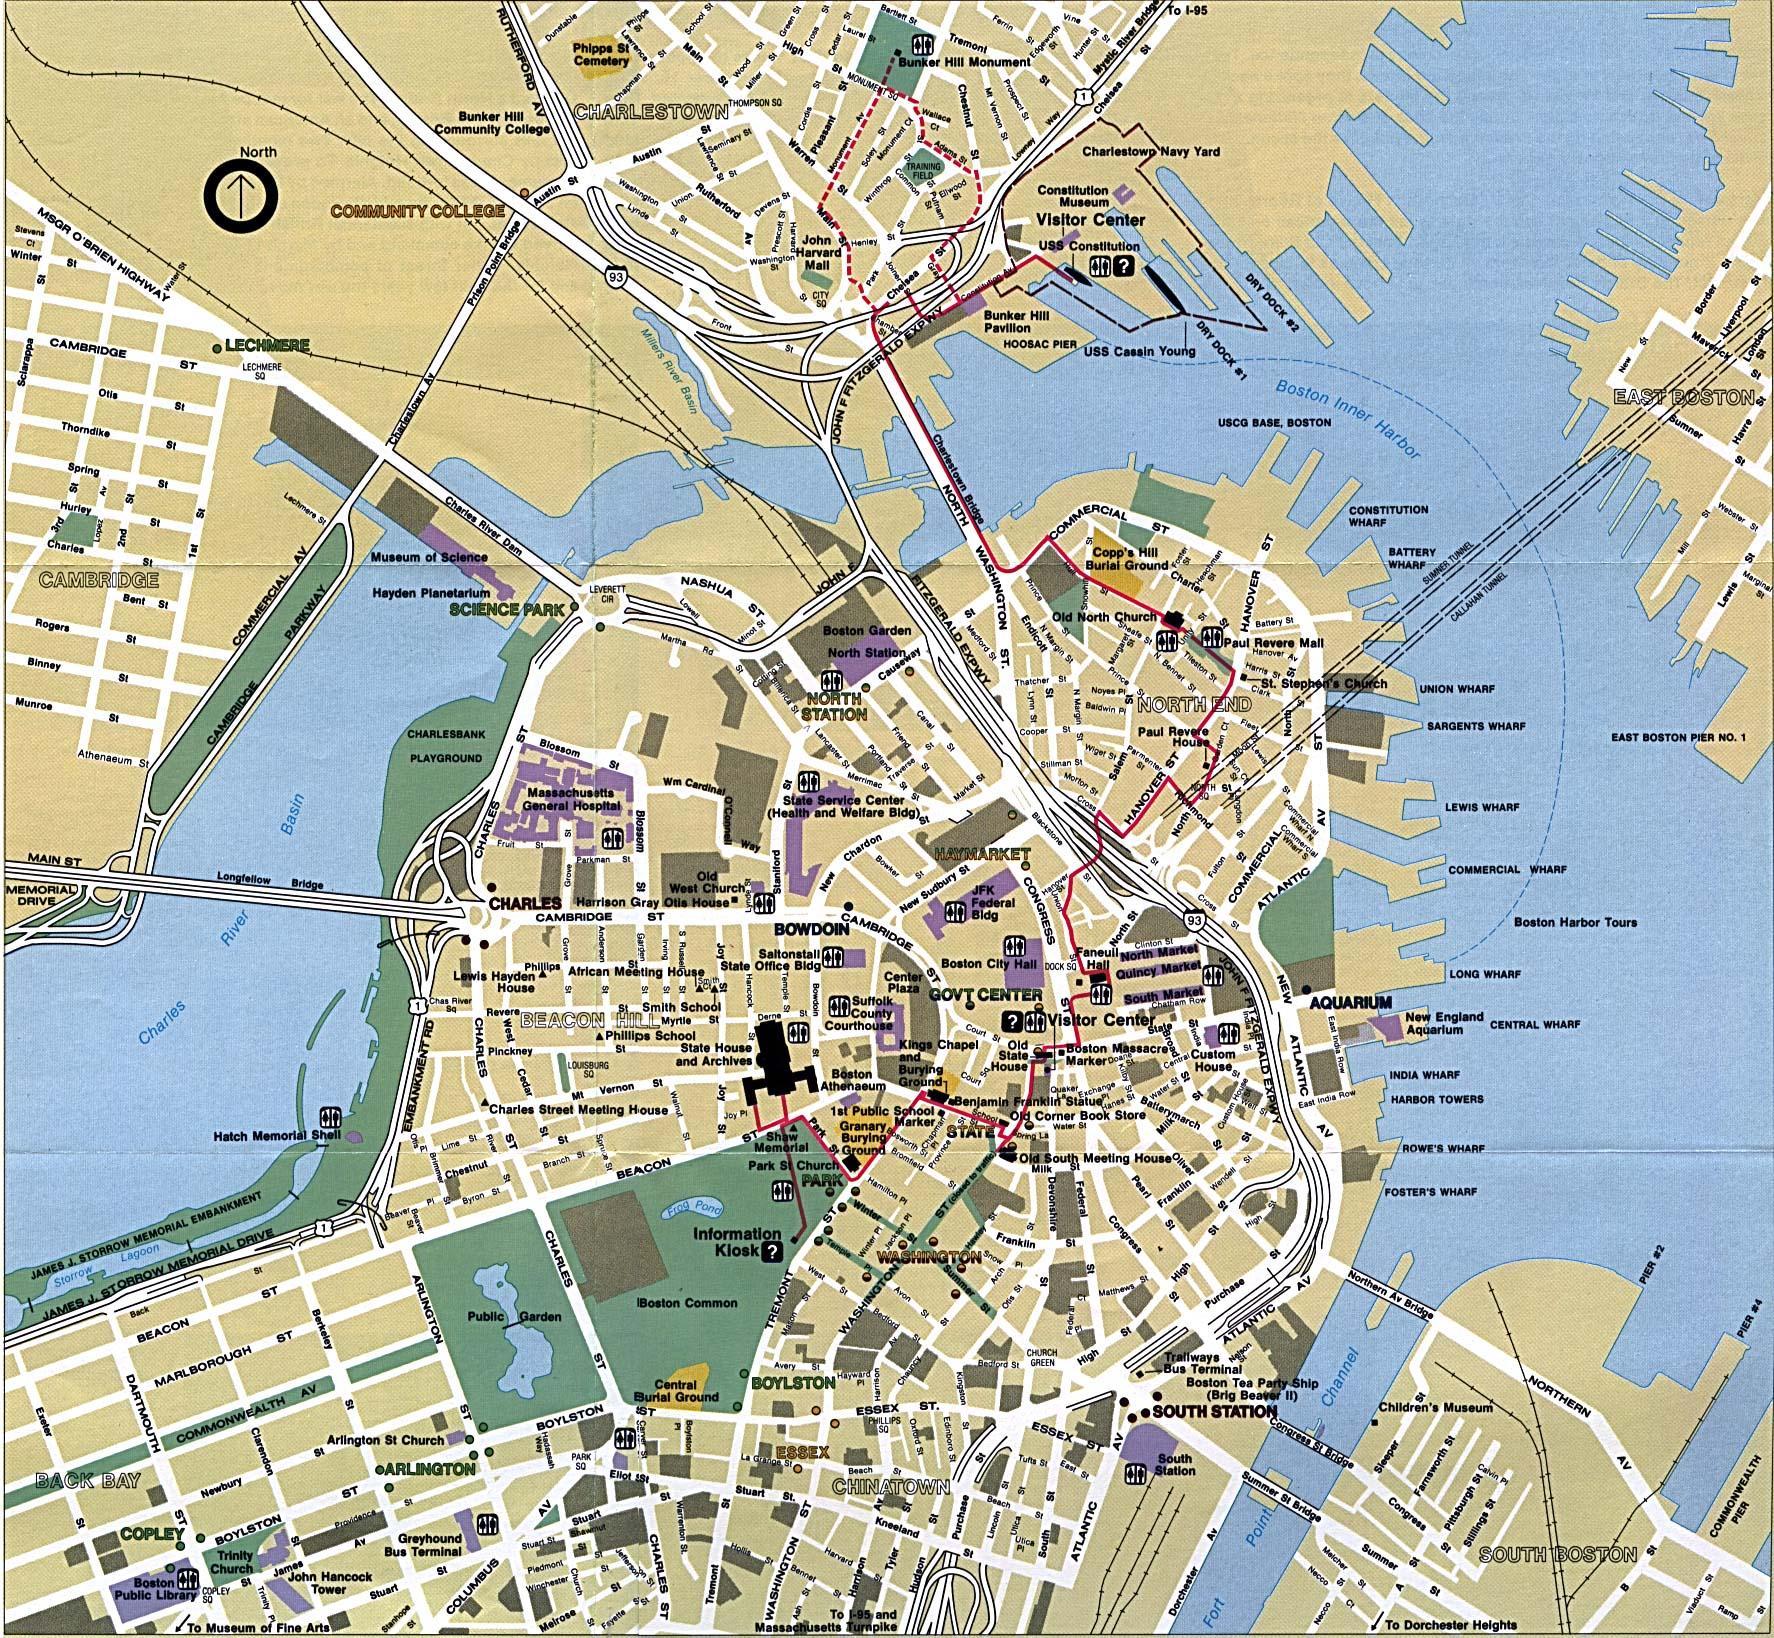 Boston Map Boston City Map United States Of America - City map of united states